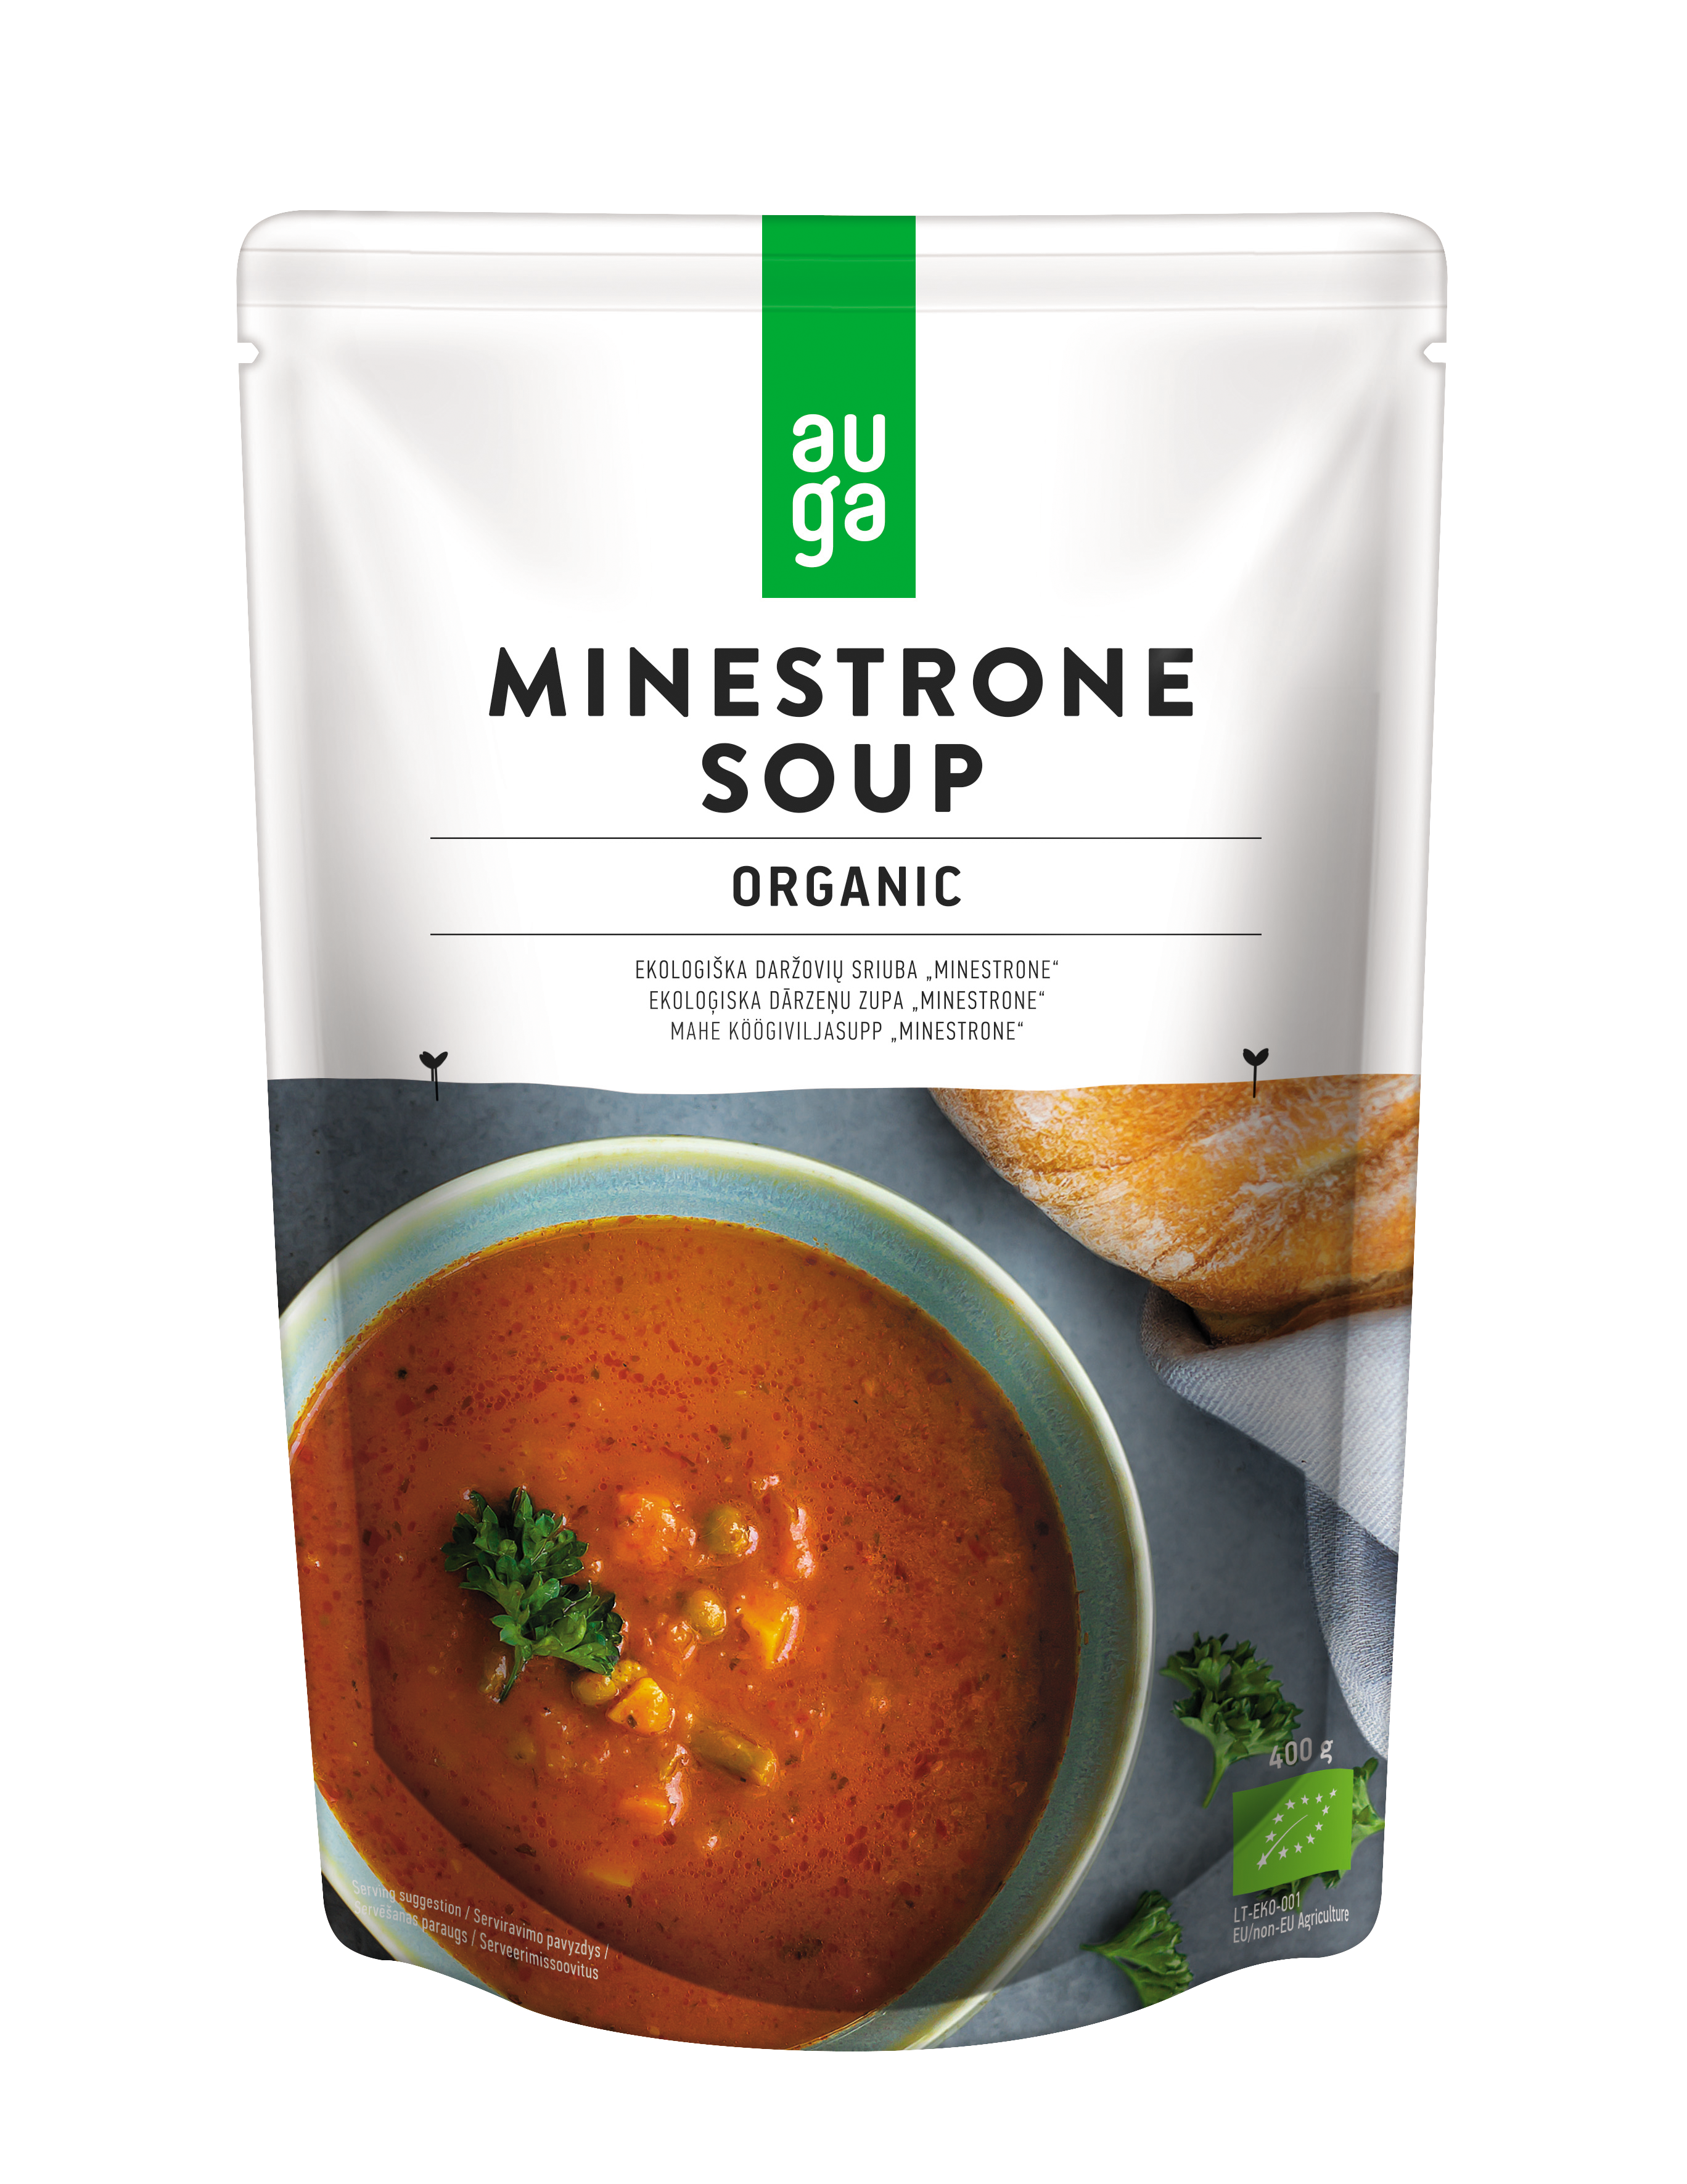 Auga organic ministrone soup